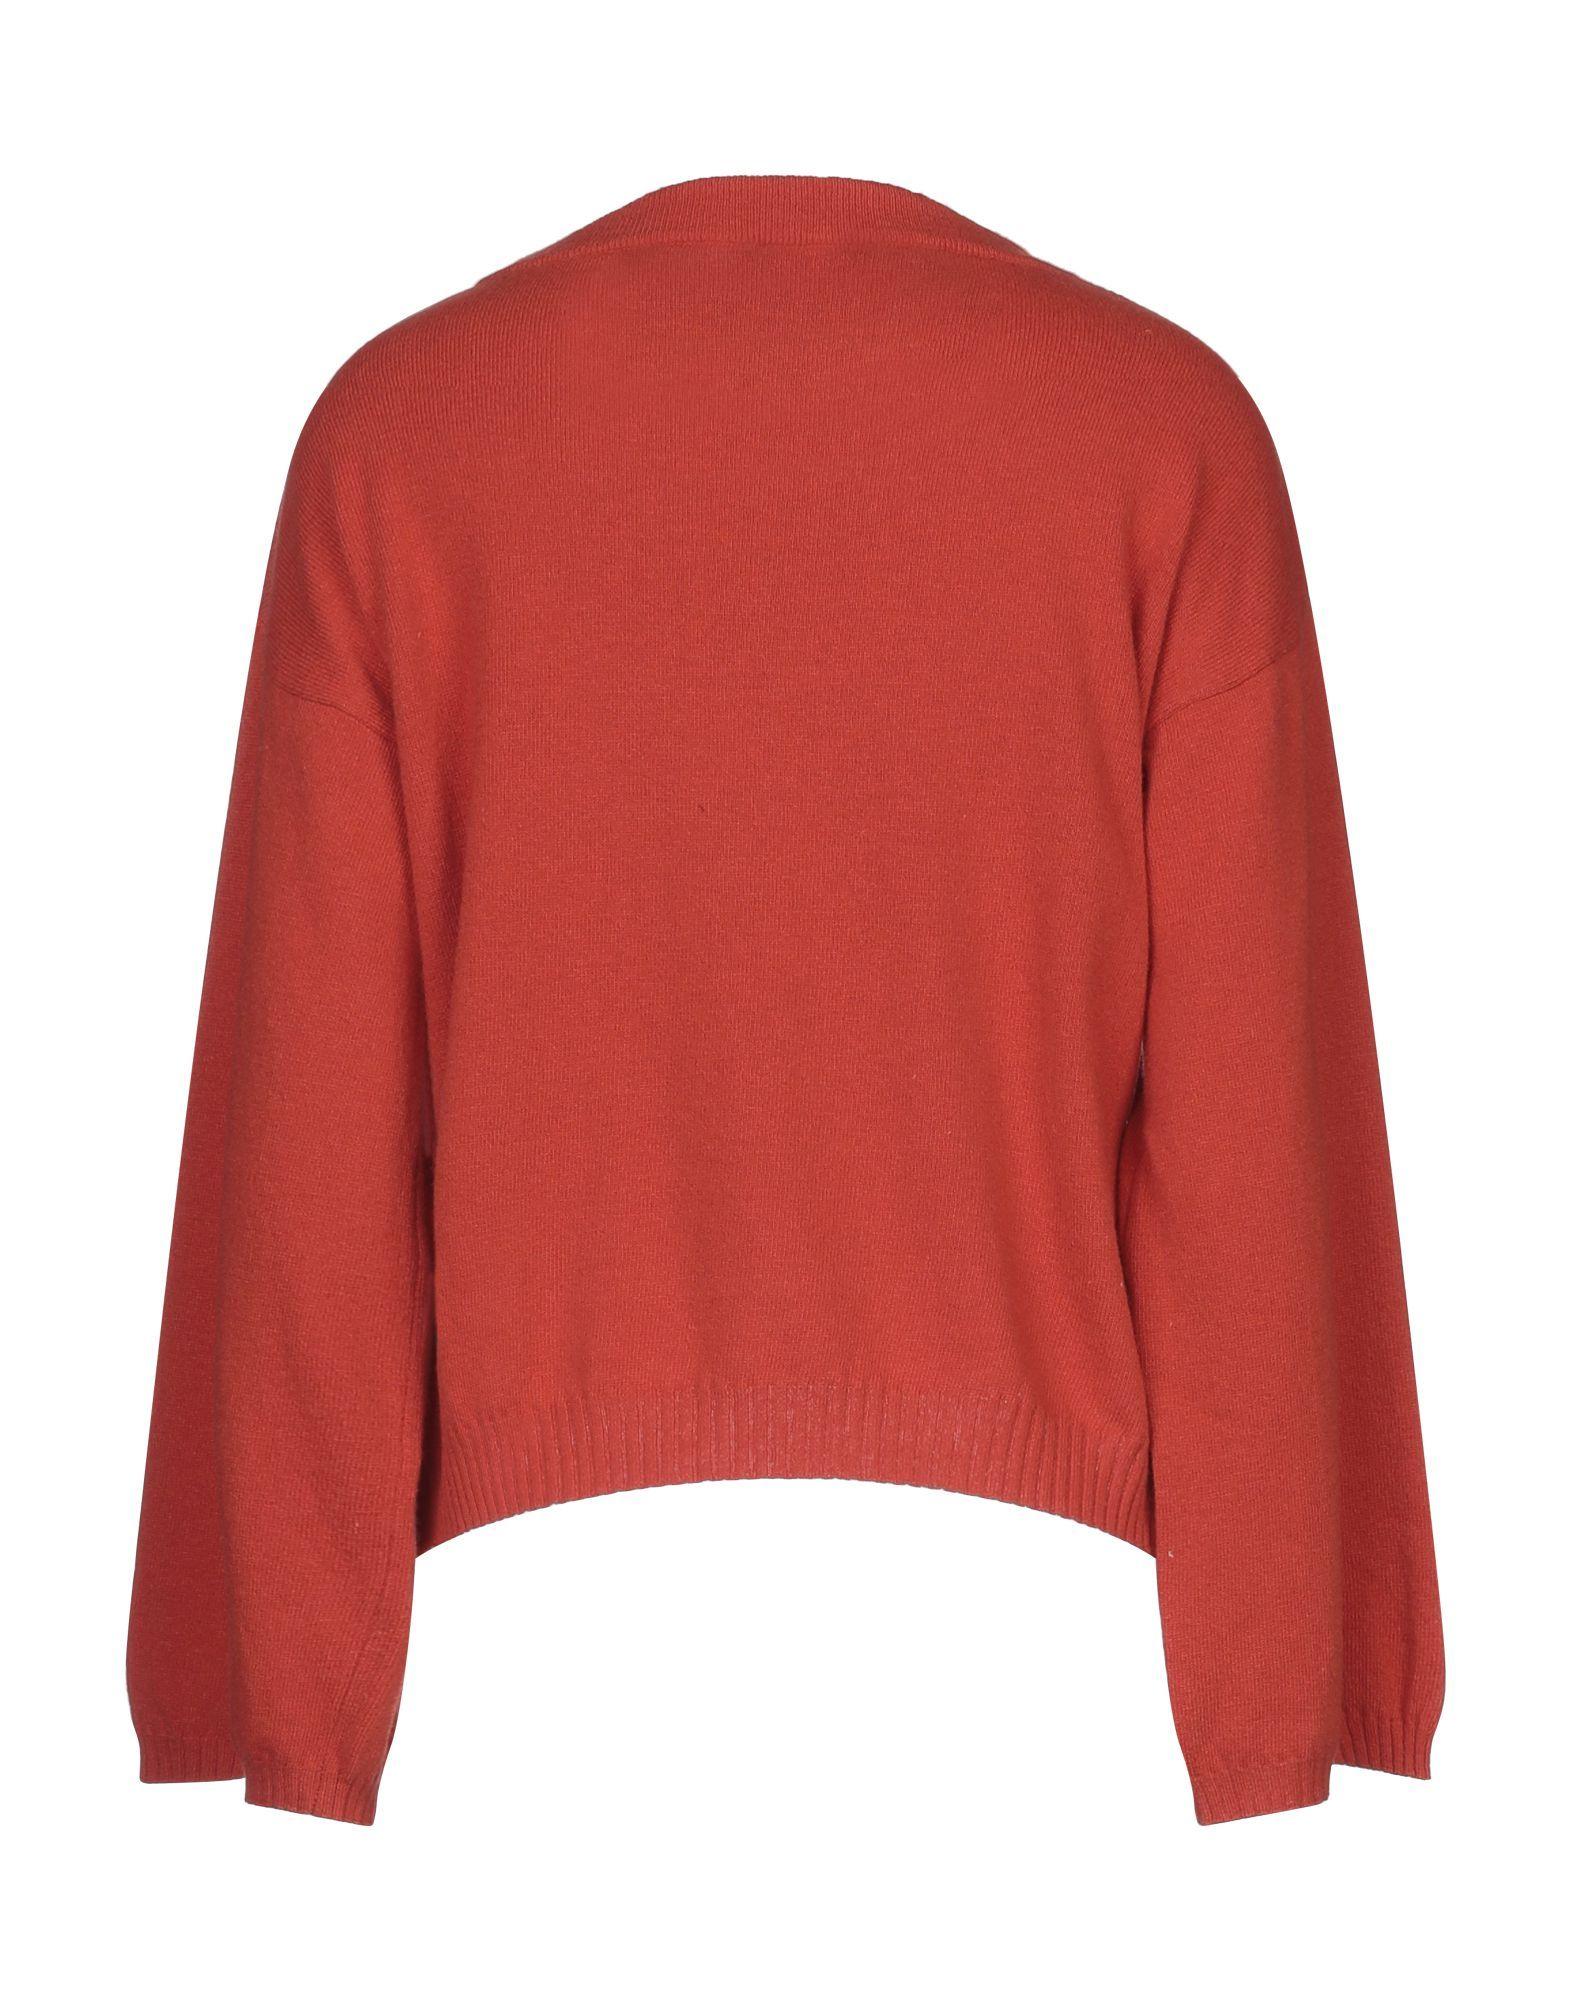 Vicolo Orange Lightweight Knit Jumper